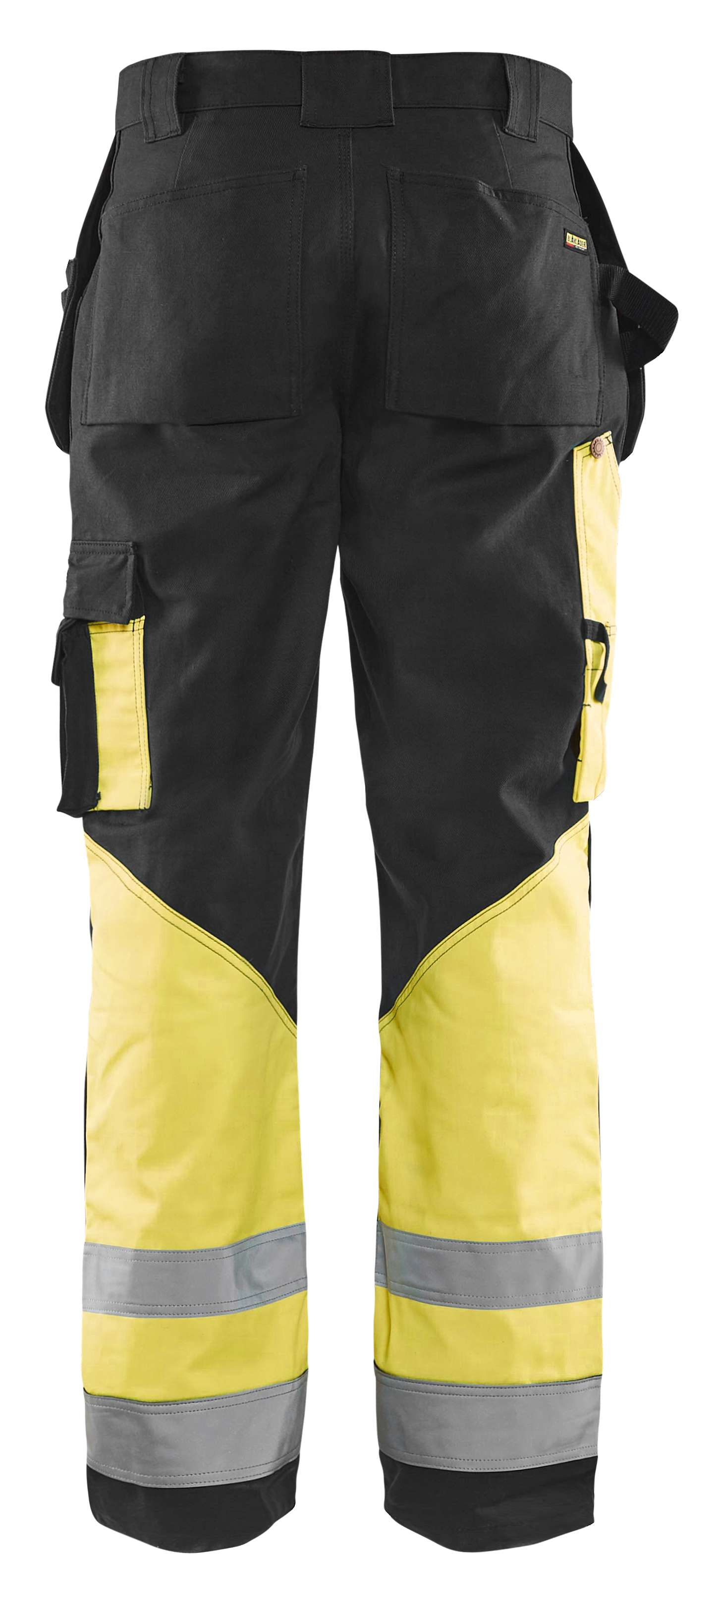 Blaklader Werkbroeken 15291370 High Vis zwart-geel(9933)